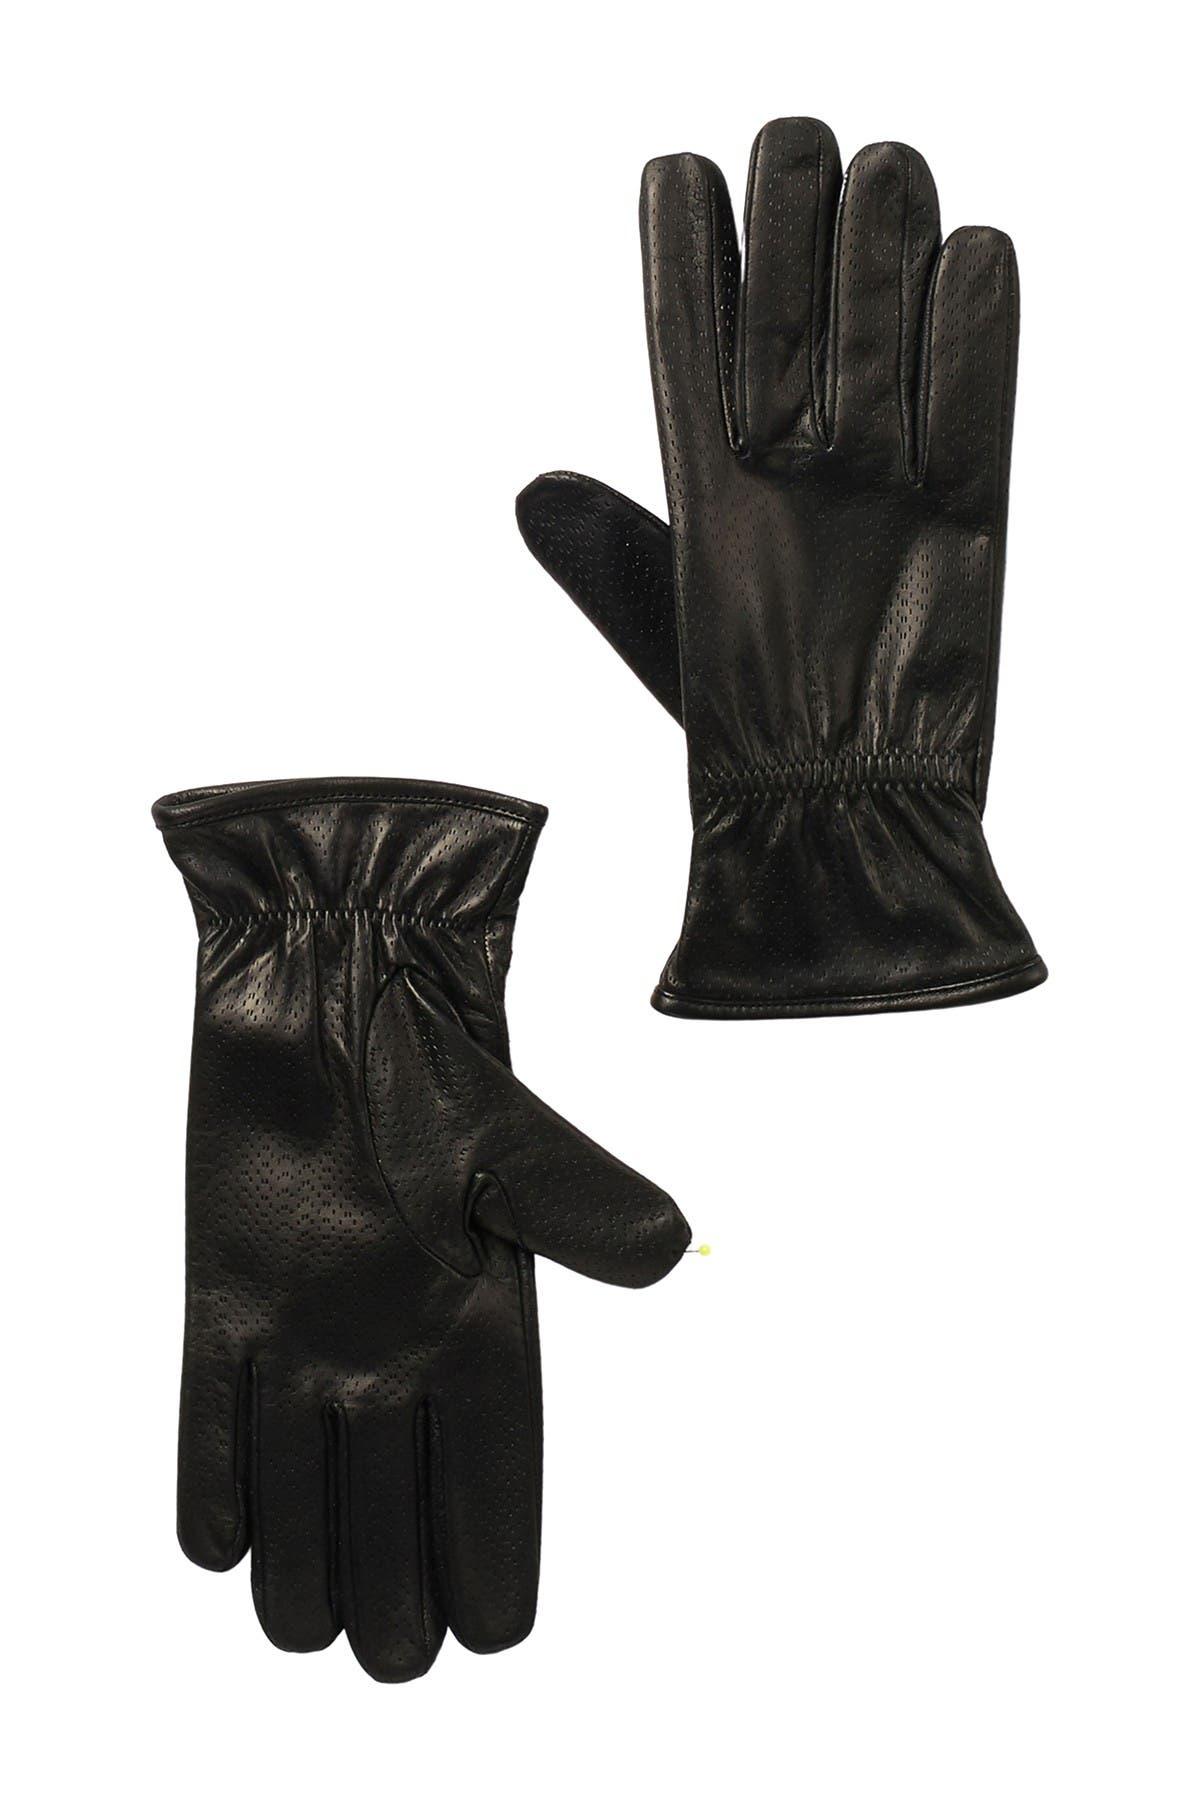 Image of Portolano Perforated Nappa Leather Gloves